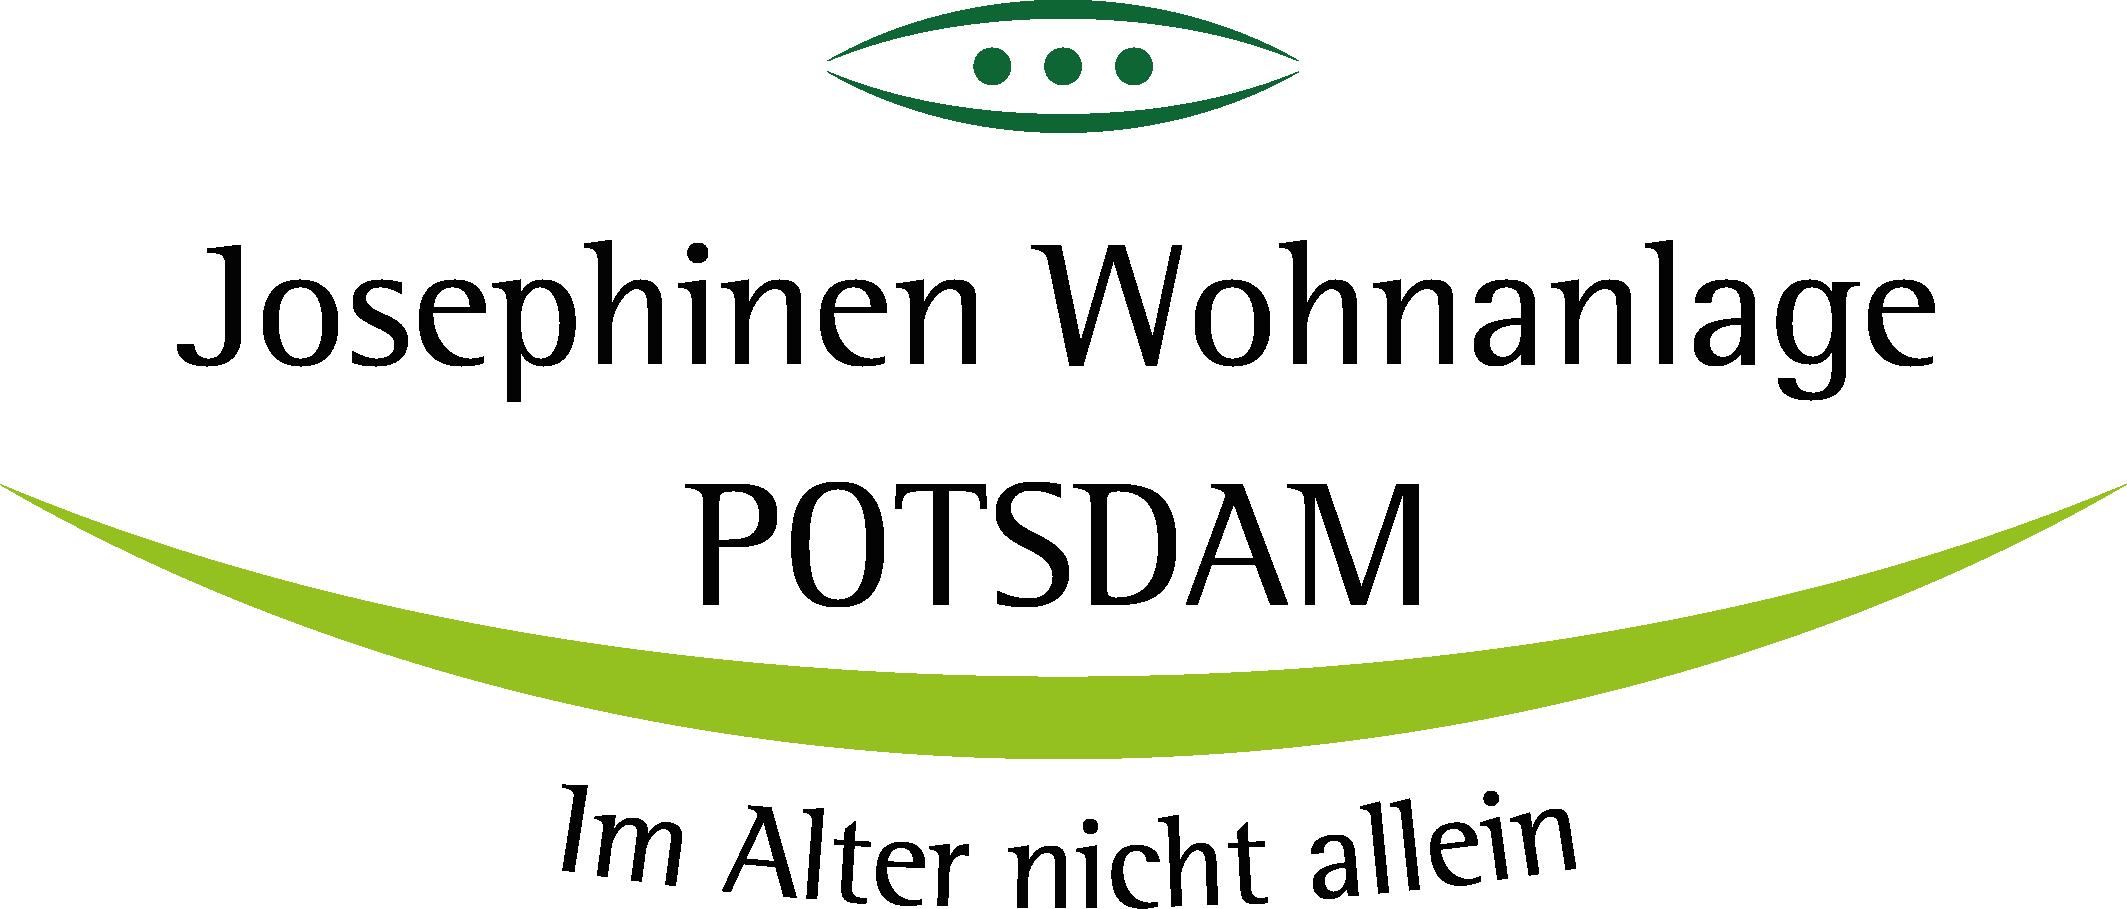 Josephinen Wohnanlage Potsdam